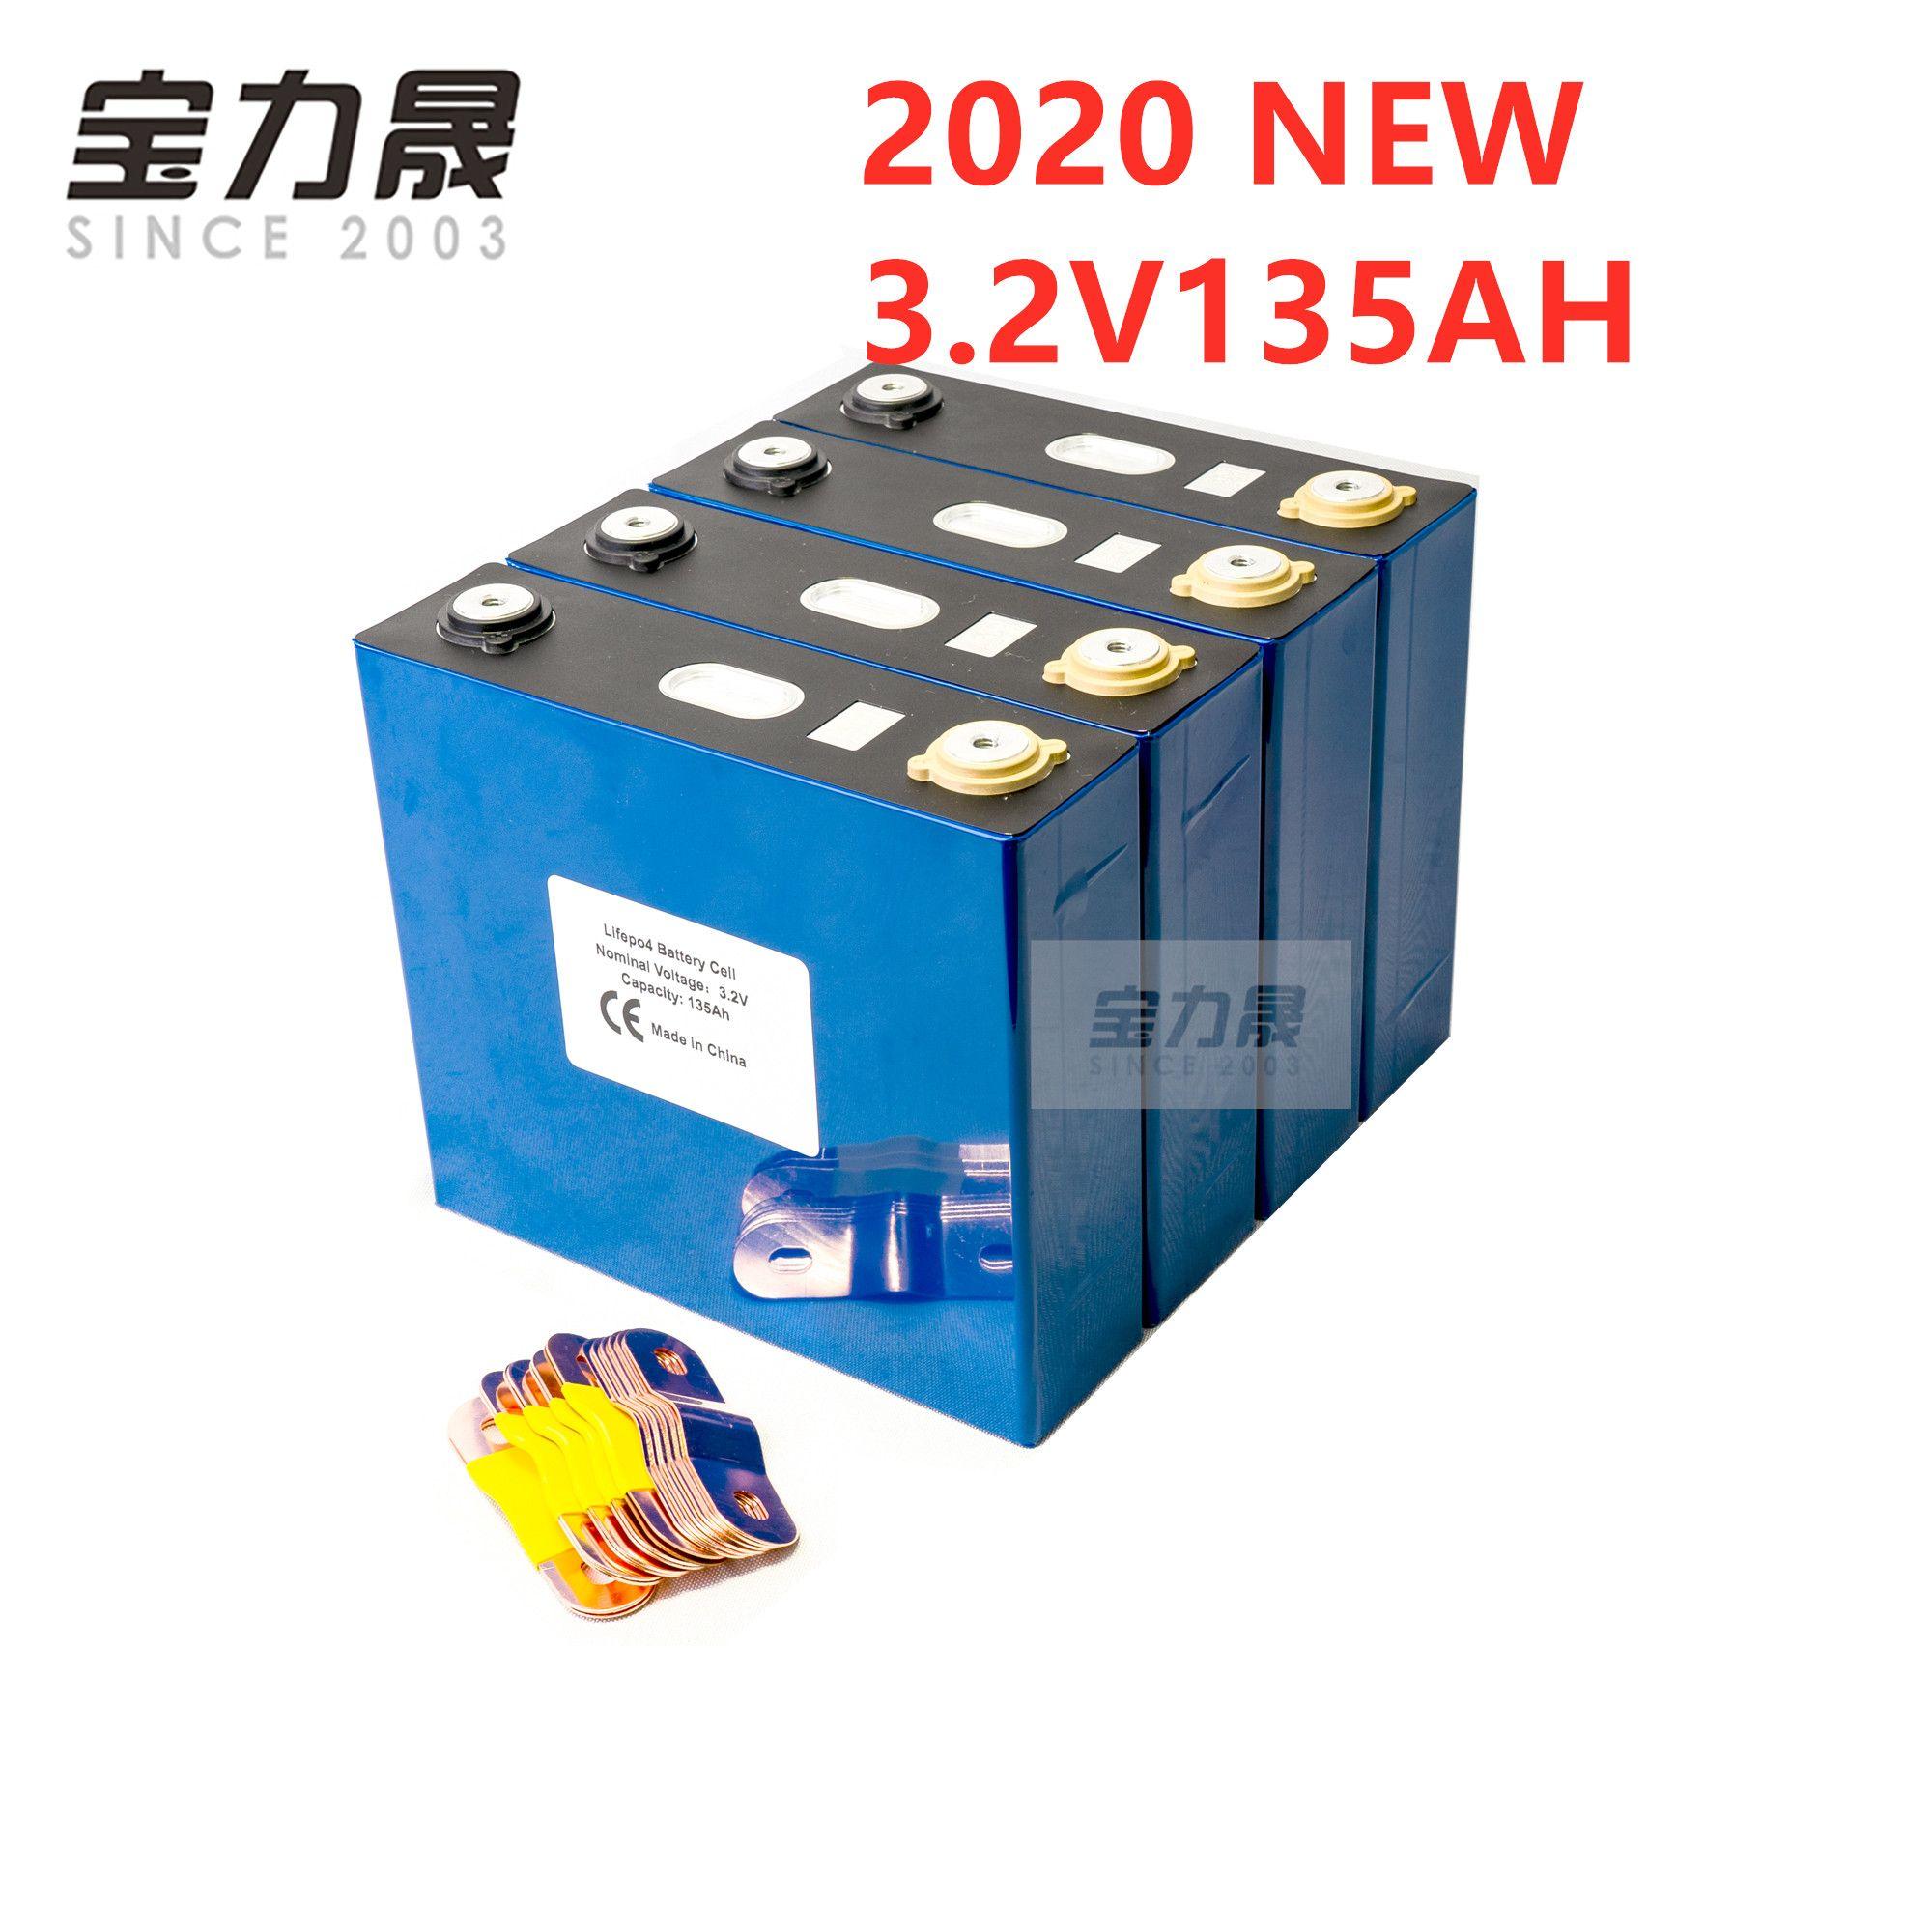 Şarj edilebilir pil Lityum Demir Fosfat Hücre 24V 12V hücreleri değil 150Ah AB ABD TAX FREE lifepo4 Sınıf A 4PCS 3,2V 120AH 135AH